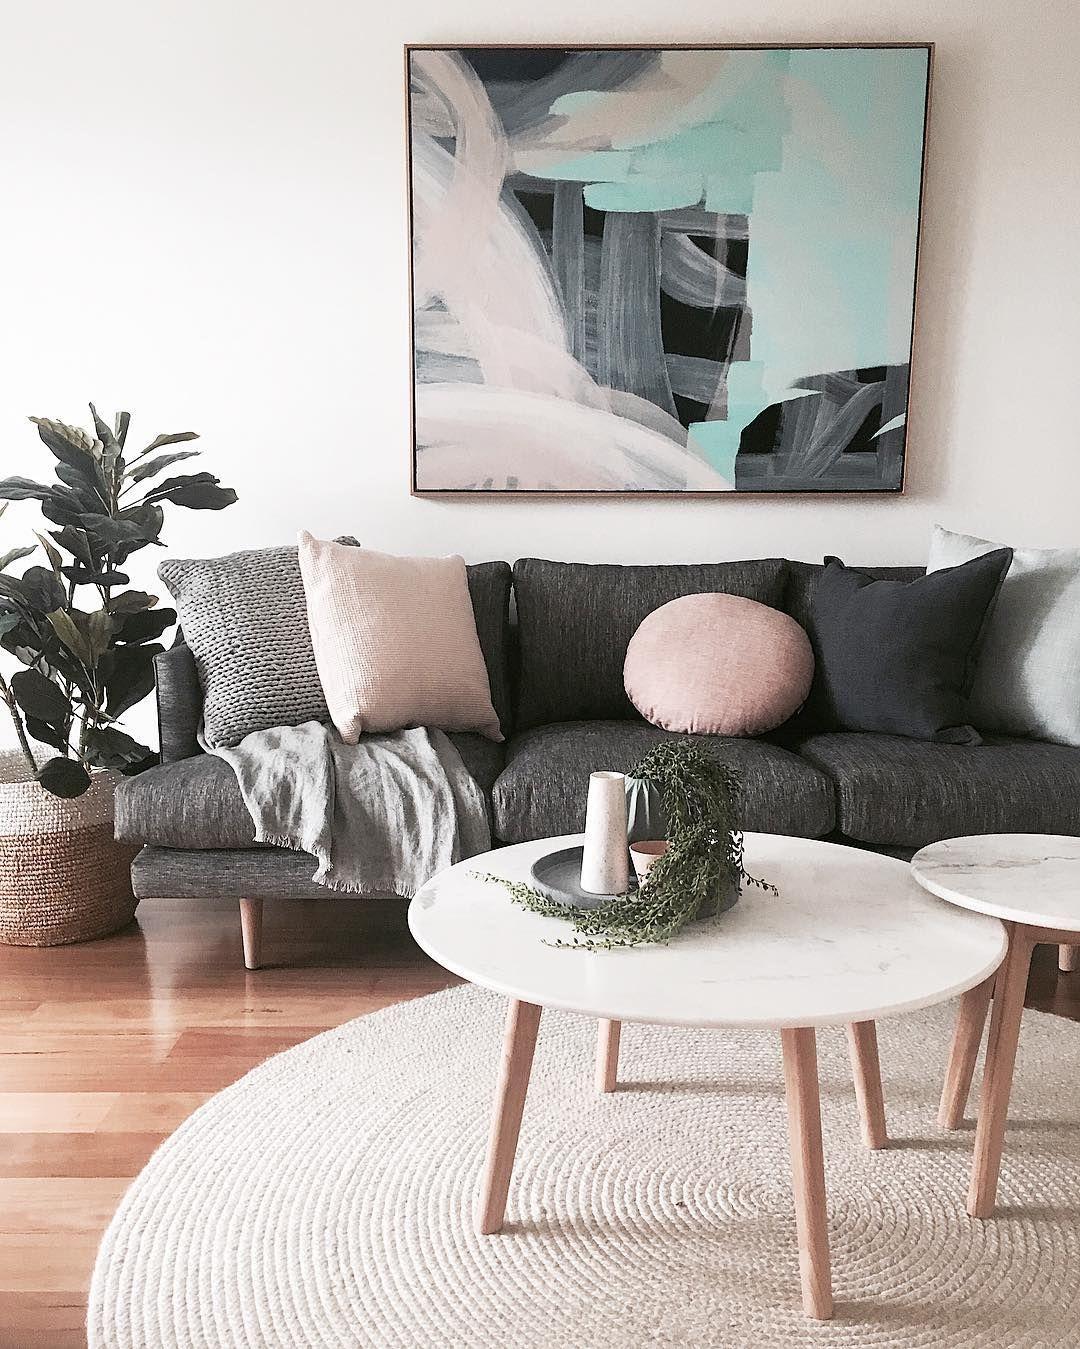 Pin By Hannah Bamba On Dream House Interior